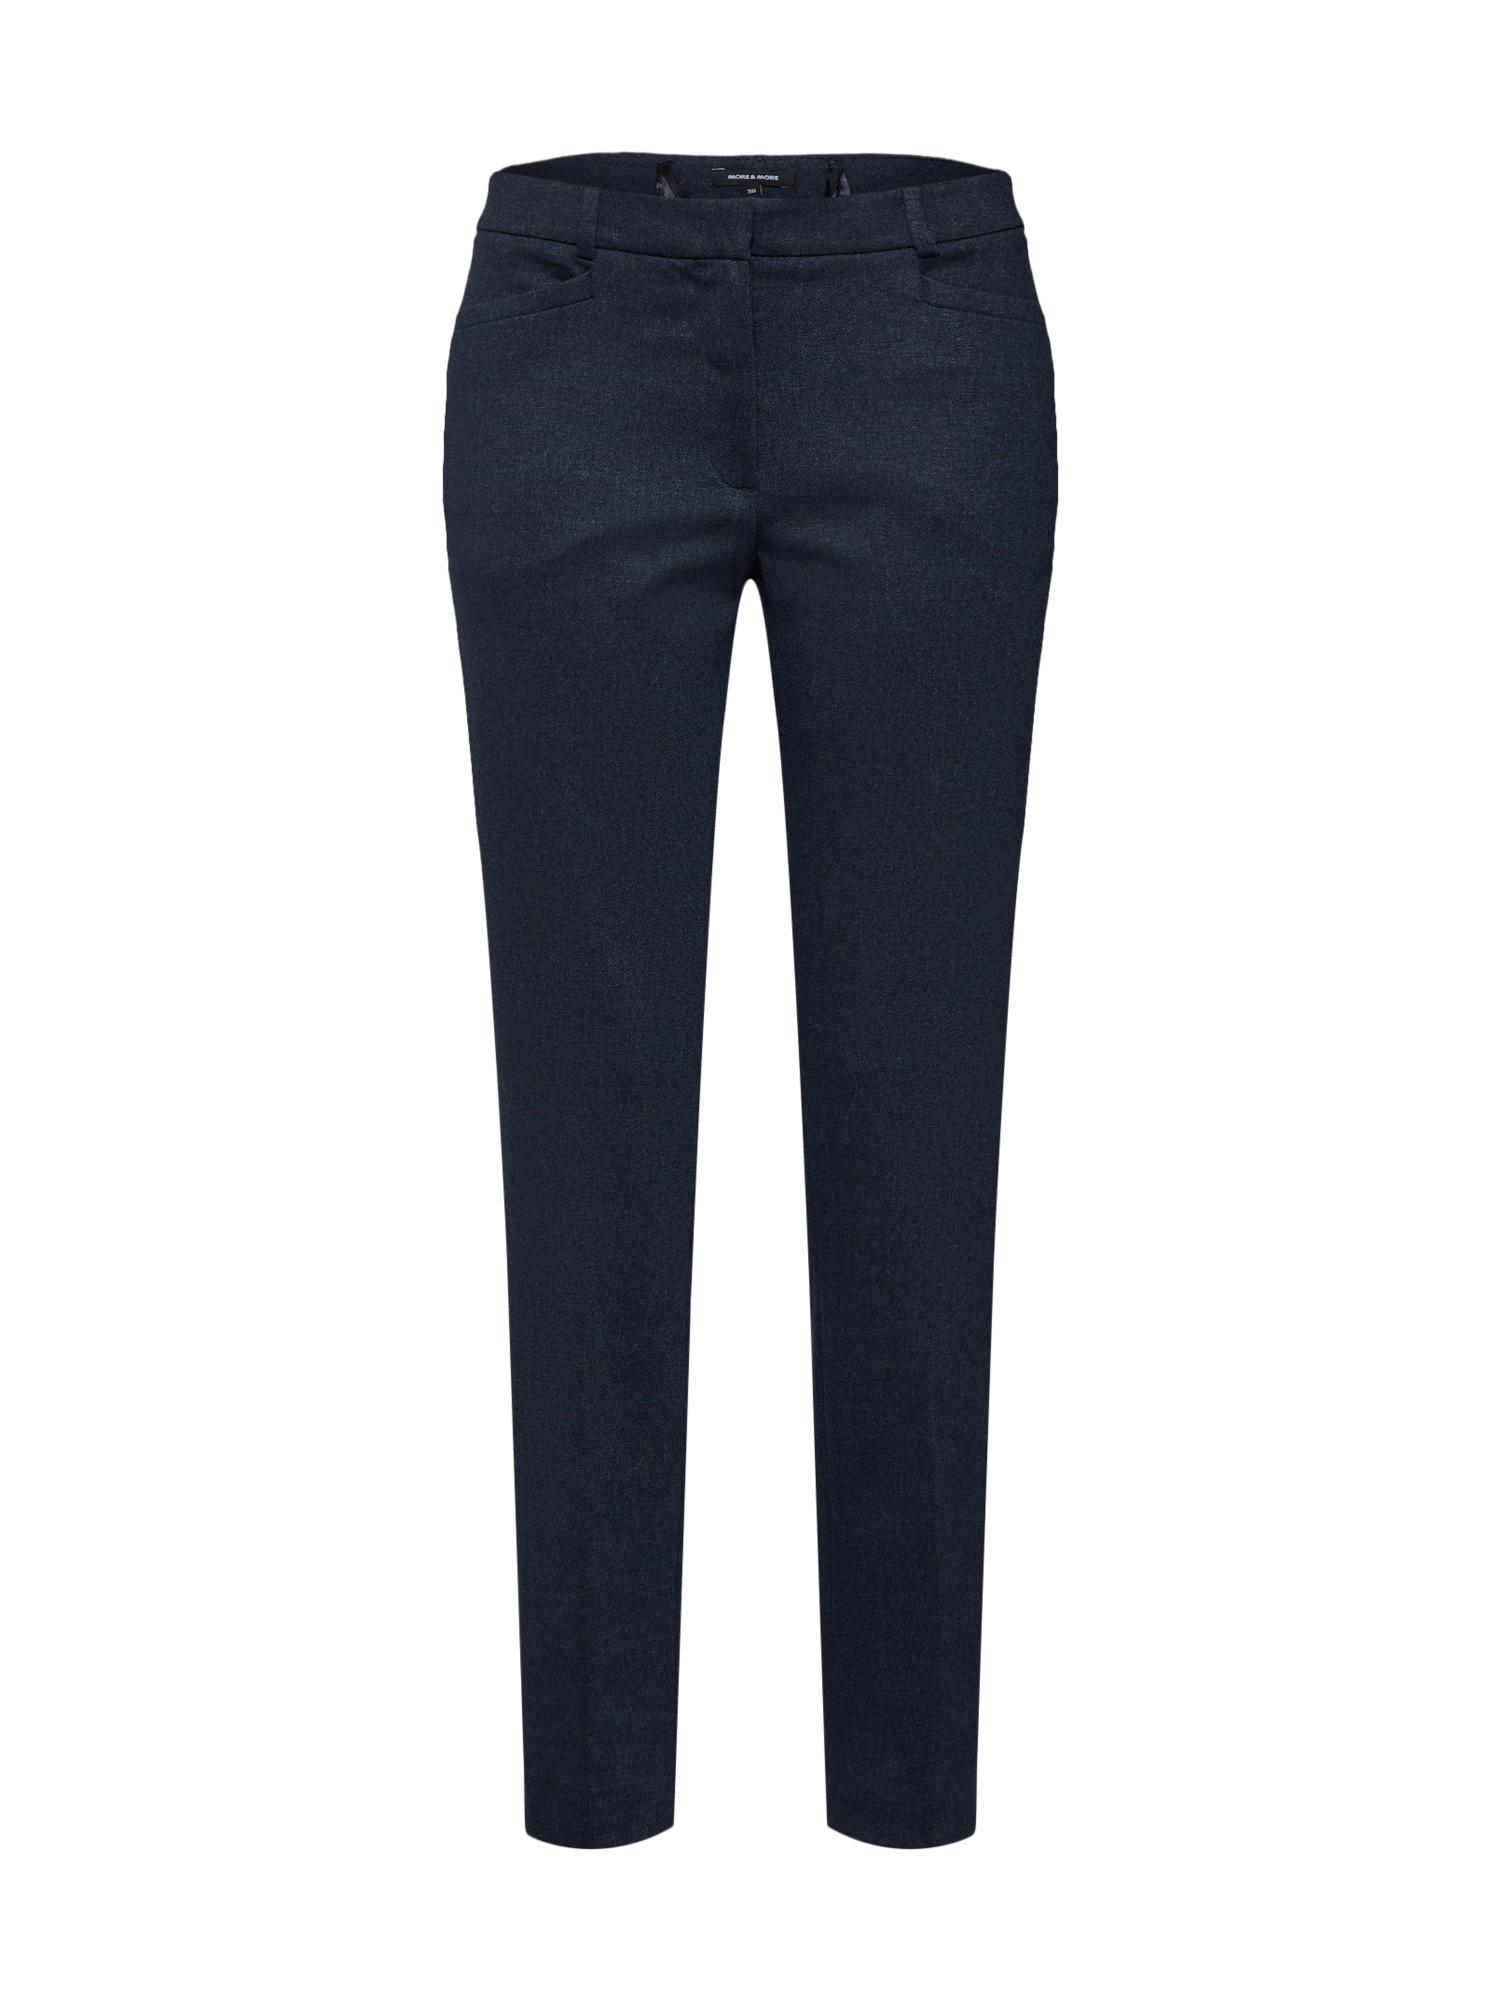 Kalhoty s puky marine modrá MORE & MORE